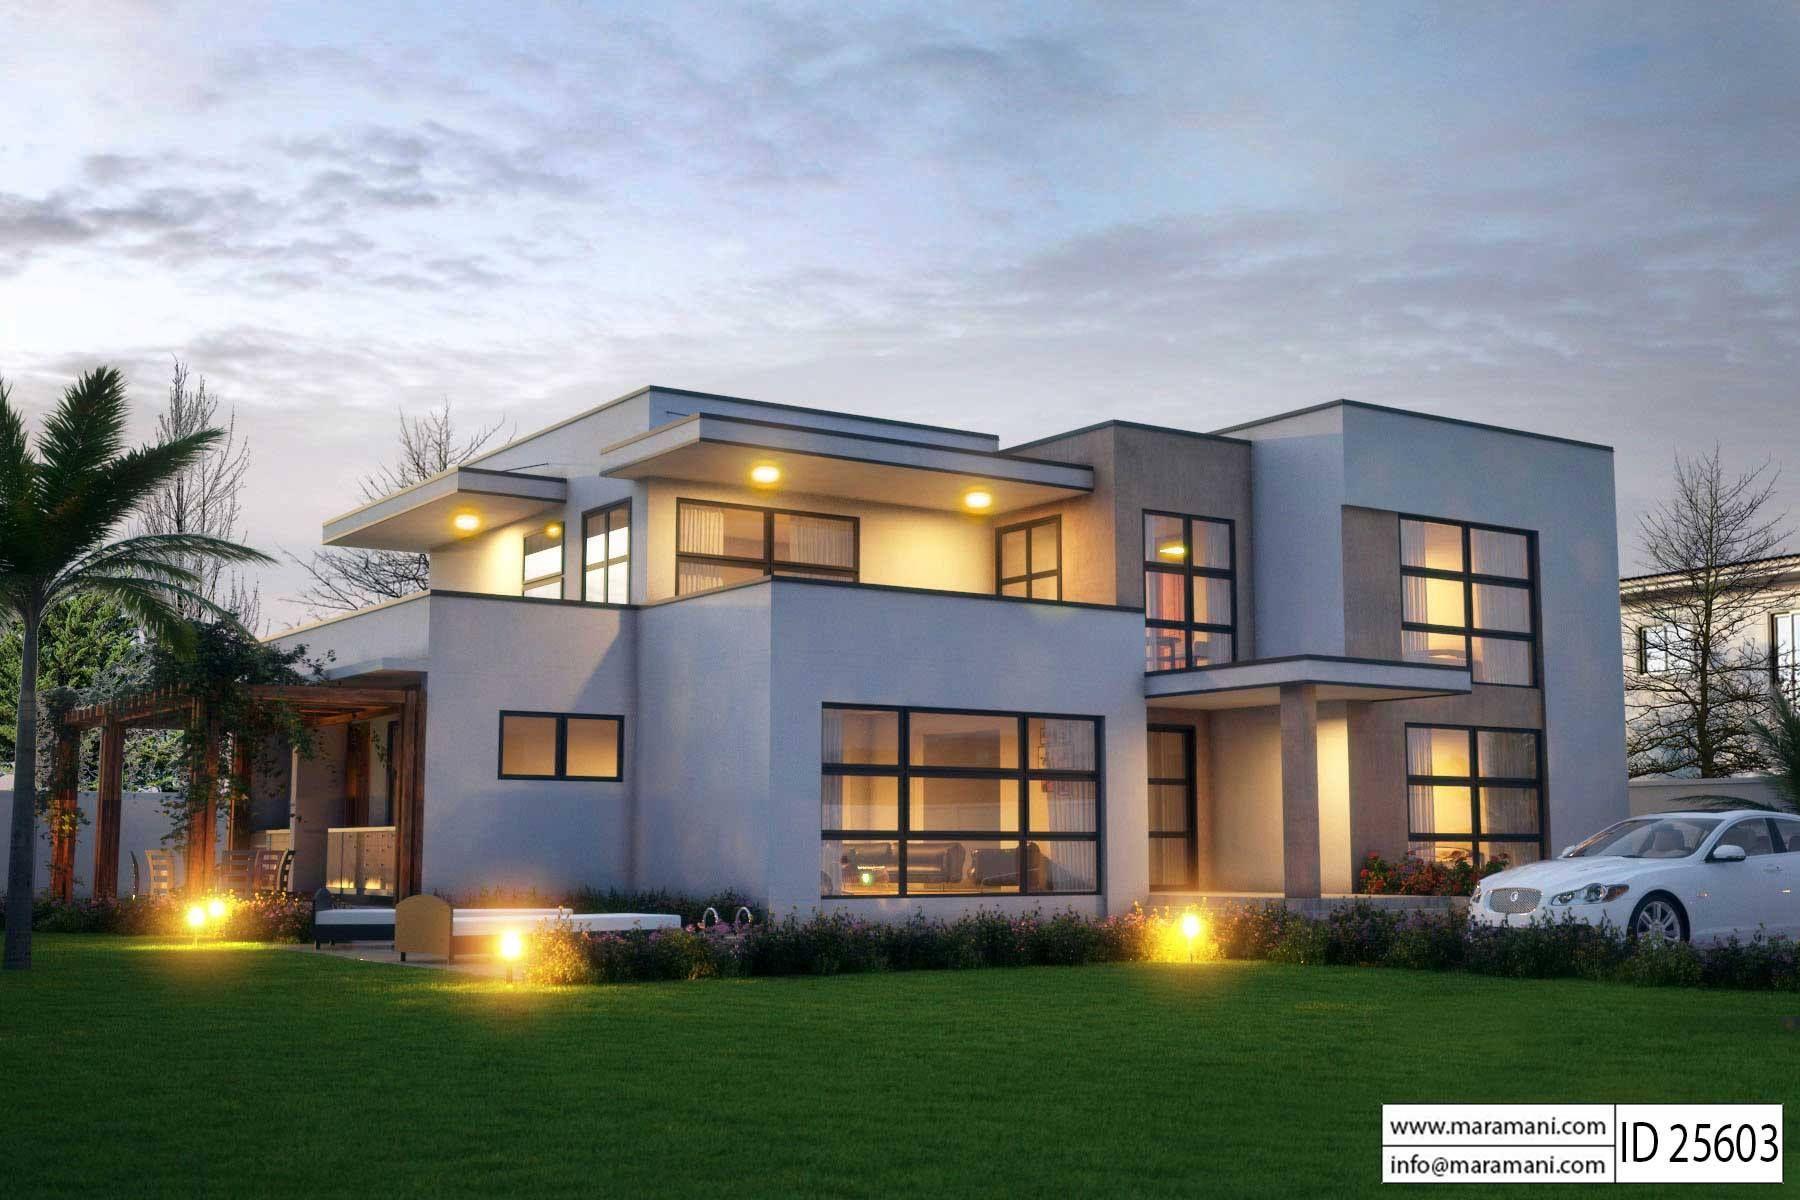 Modern bedroom house design id floor plans by maramani exteriordesign outdoor also architecture pinterest rh